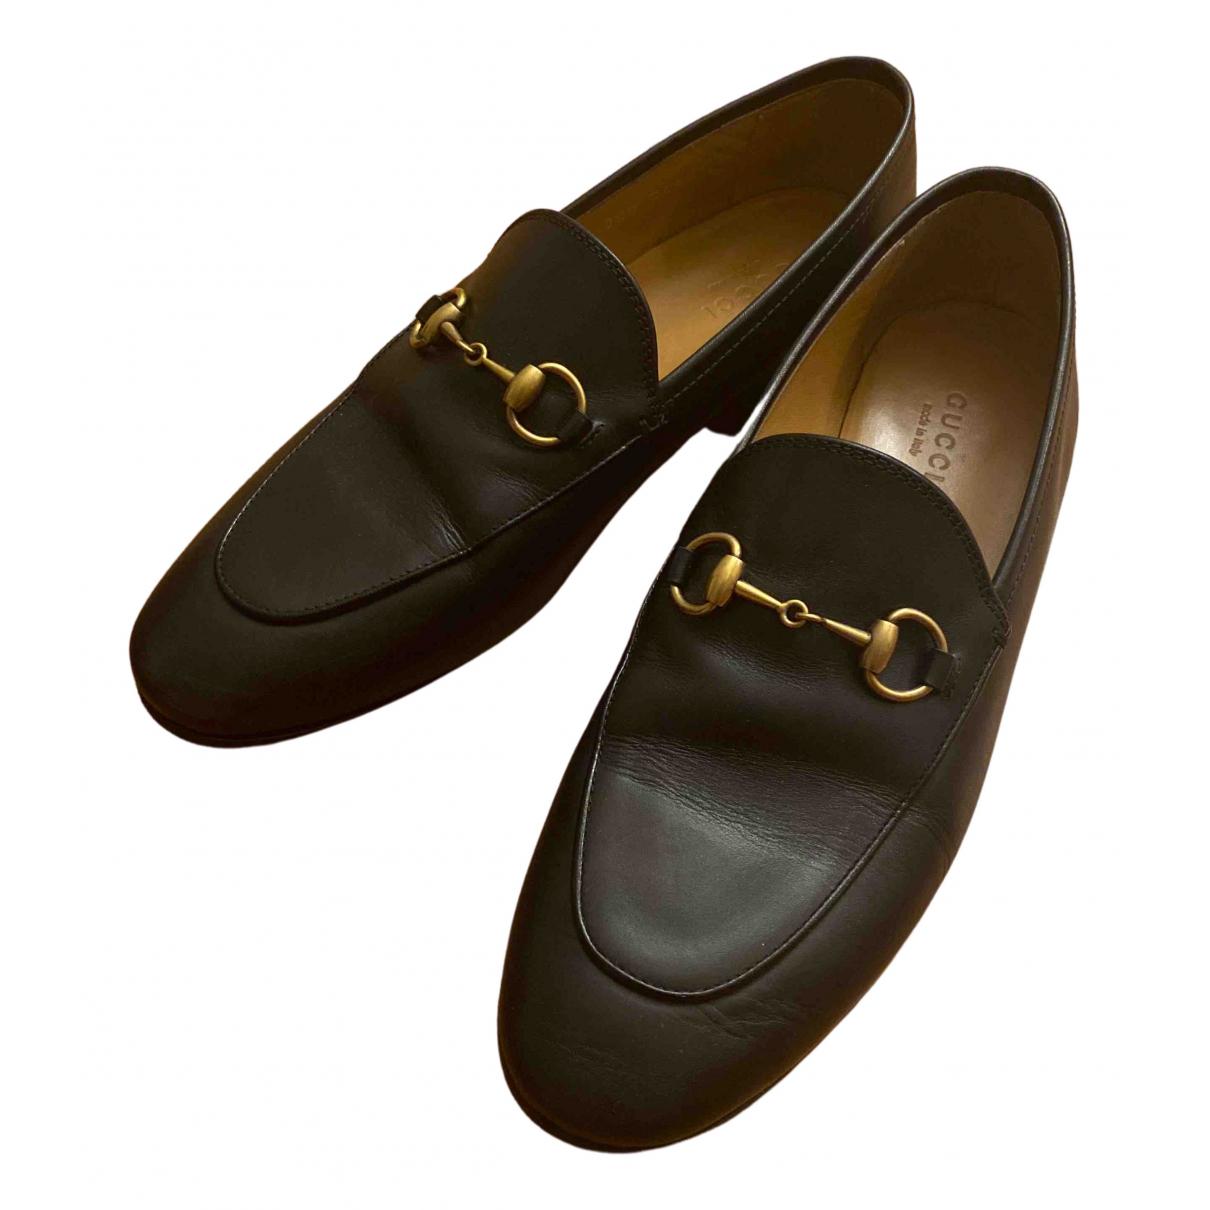 Gucci Jordaan Black Leather Flats for Women 36.5 EU